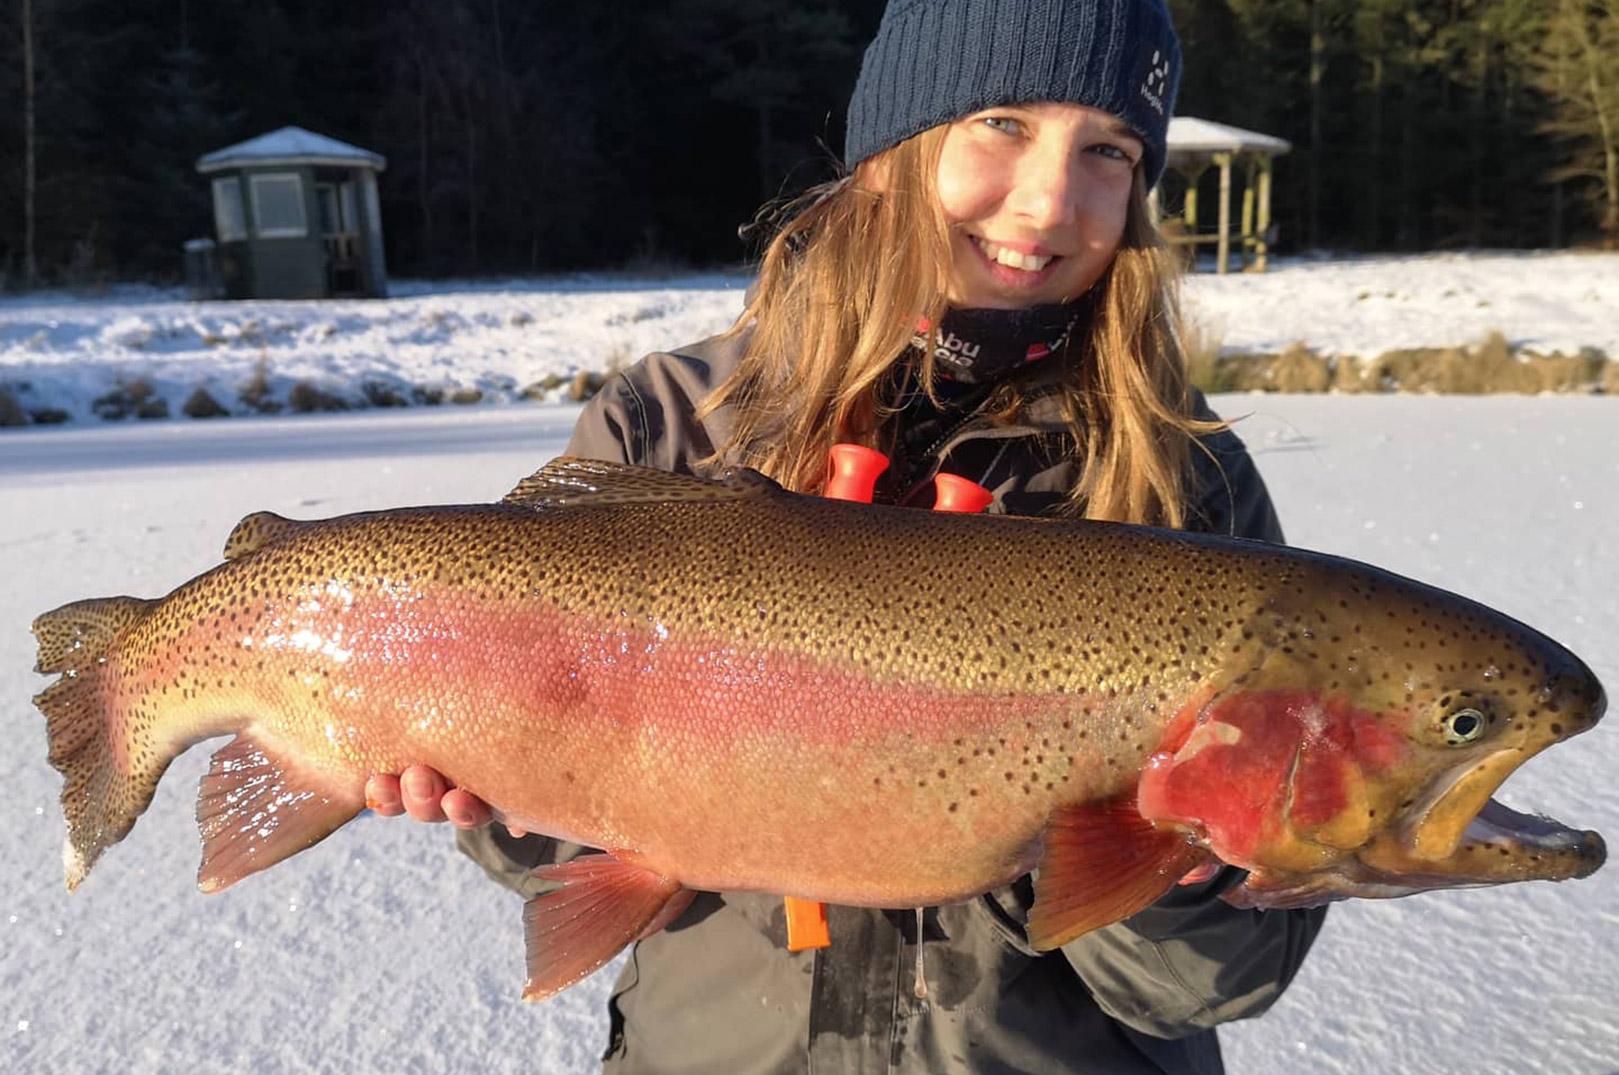 Irena Mathiasen med den største fisk hun fik fra Oxriver - en regnbueørred på lidt over fem kilo.